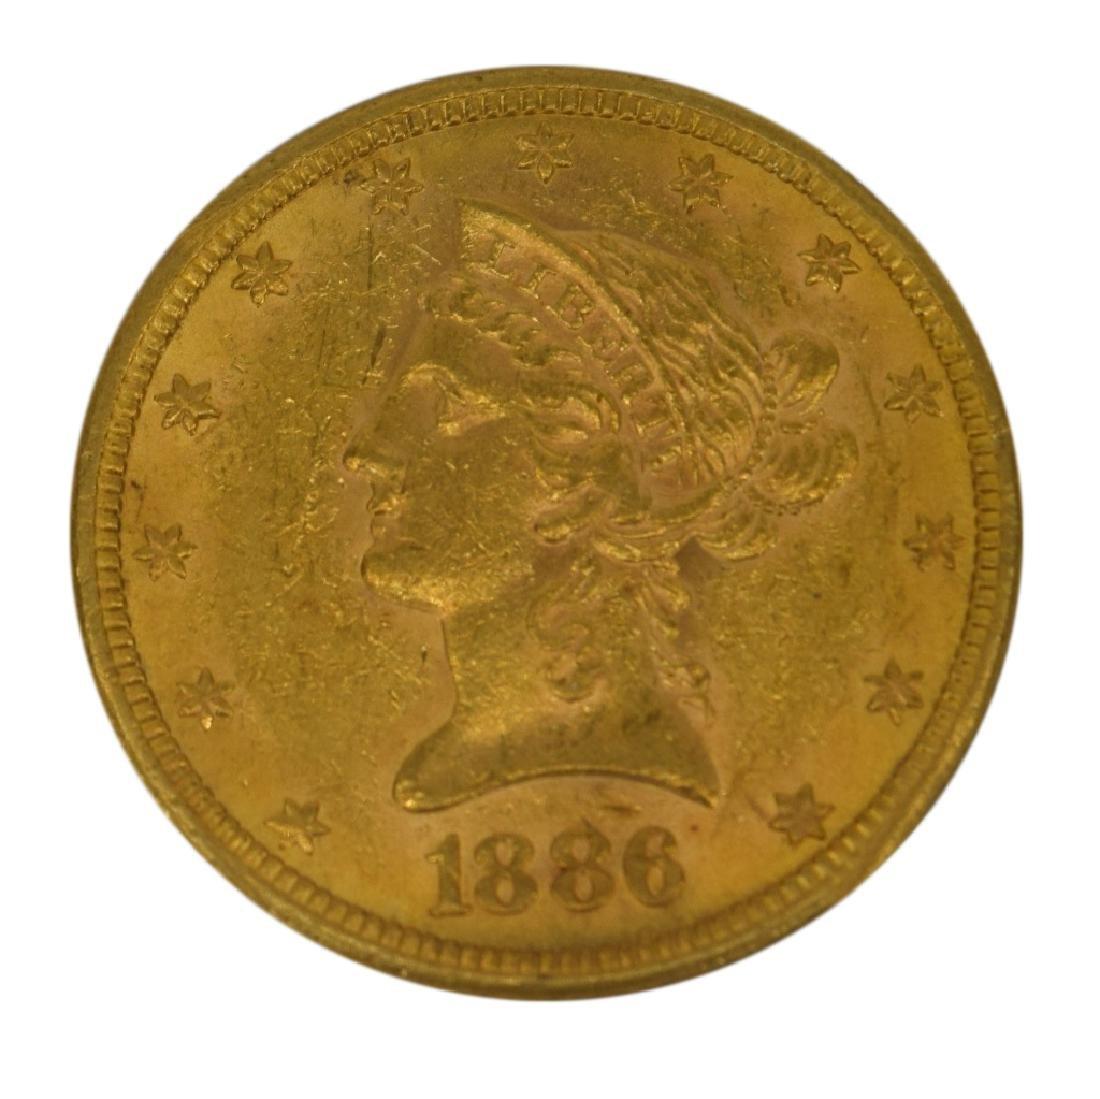 1886-S LIBERTY EAGLE $10 GOLD COIN NGC AU58